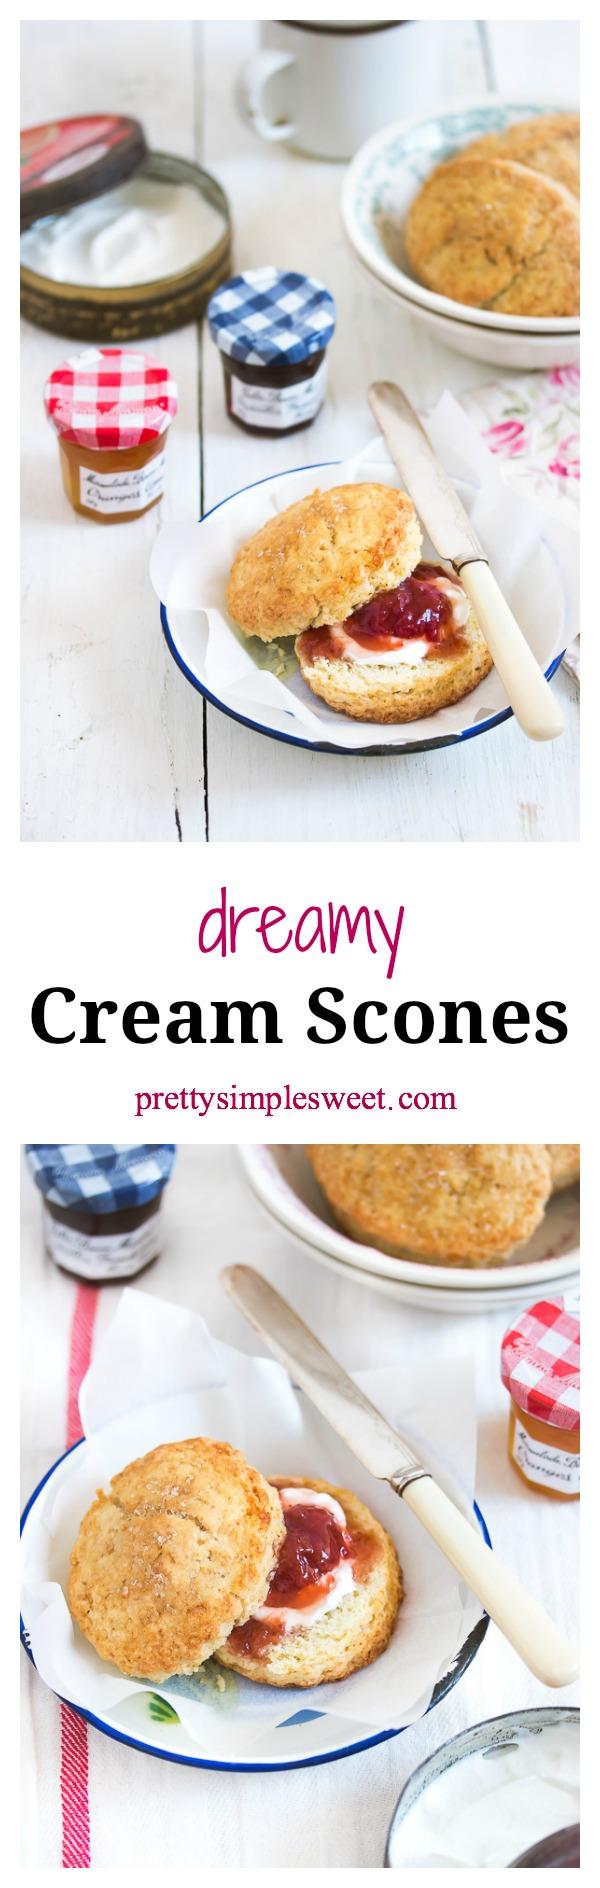 Dreamy Cream Scones | prettysimplesweet.com